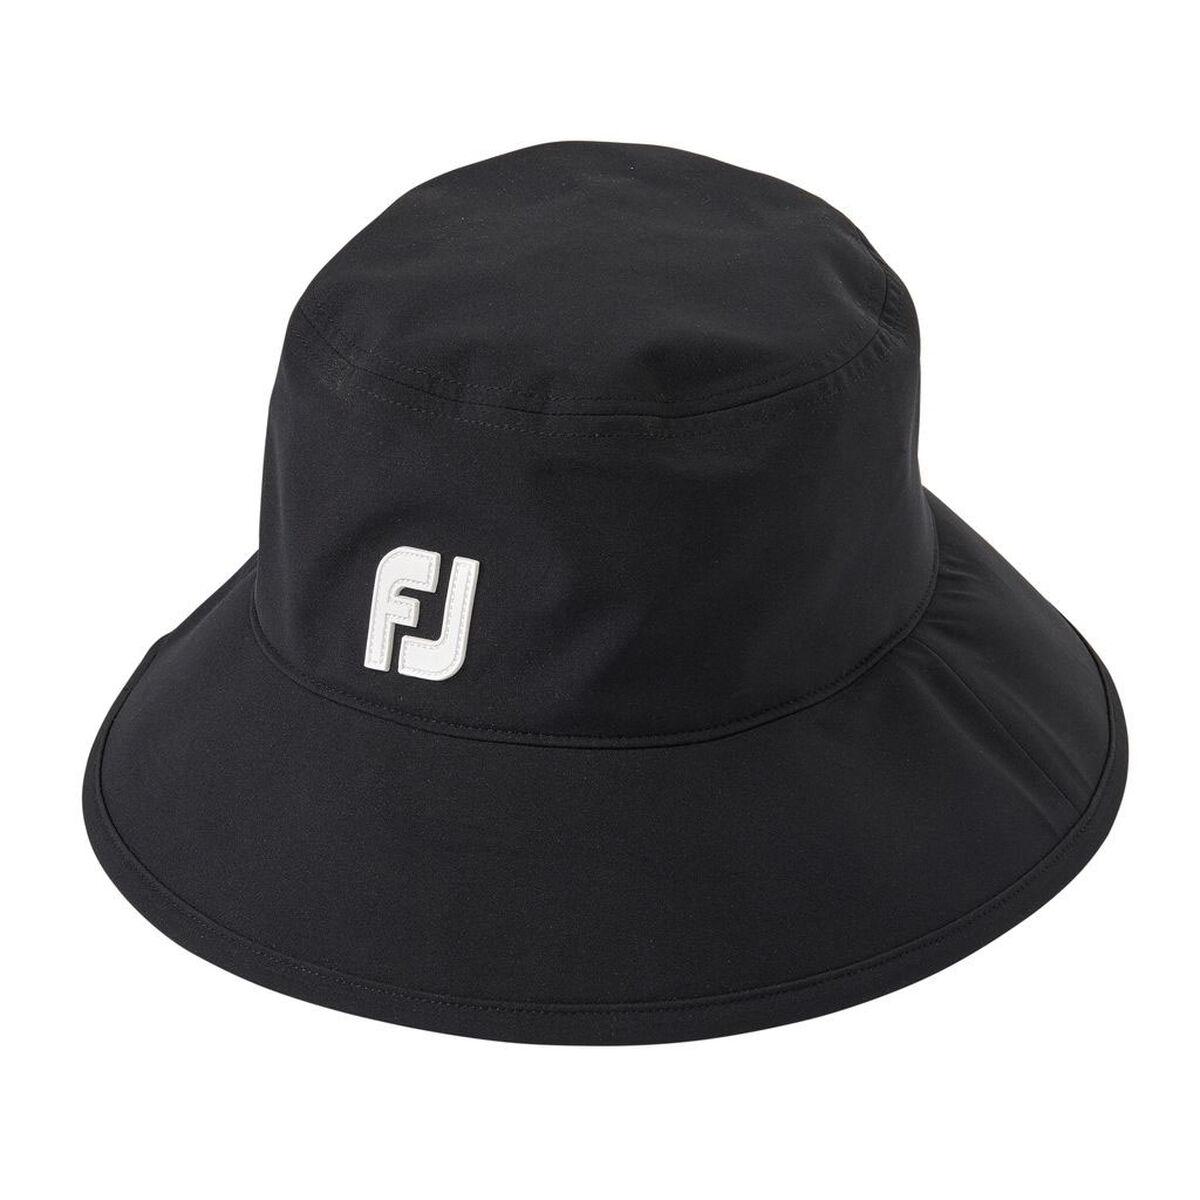 FootJoy DryJoys Tour Golf Bucket Rain Hat 1884b780396